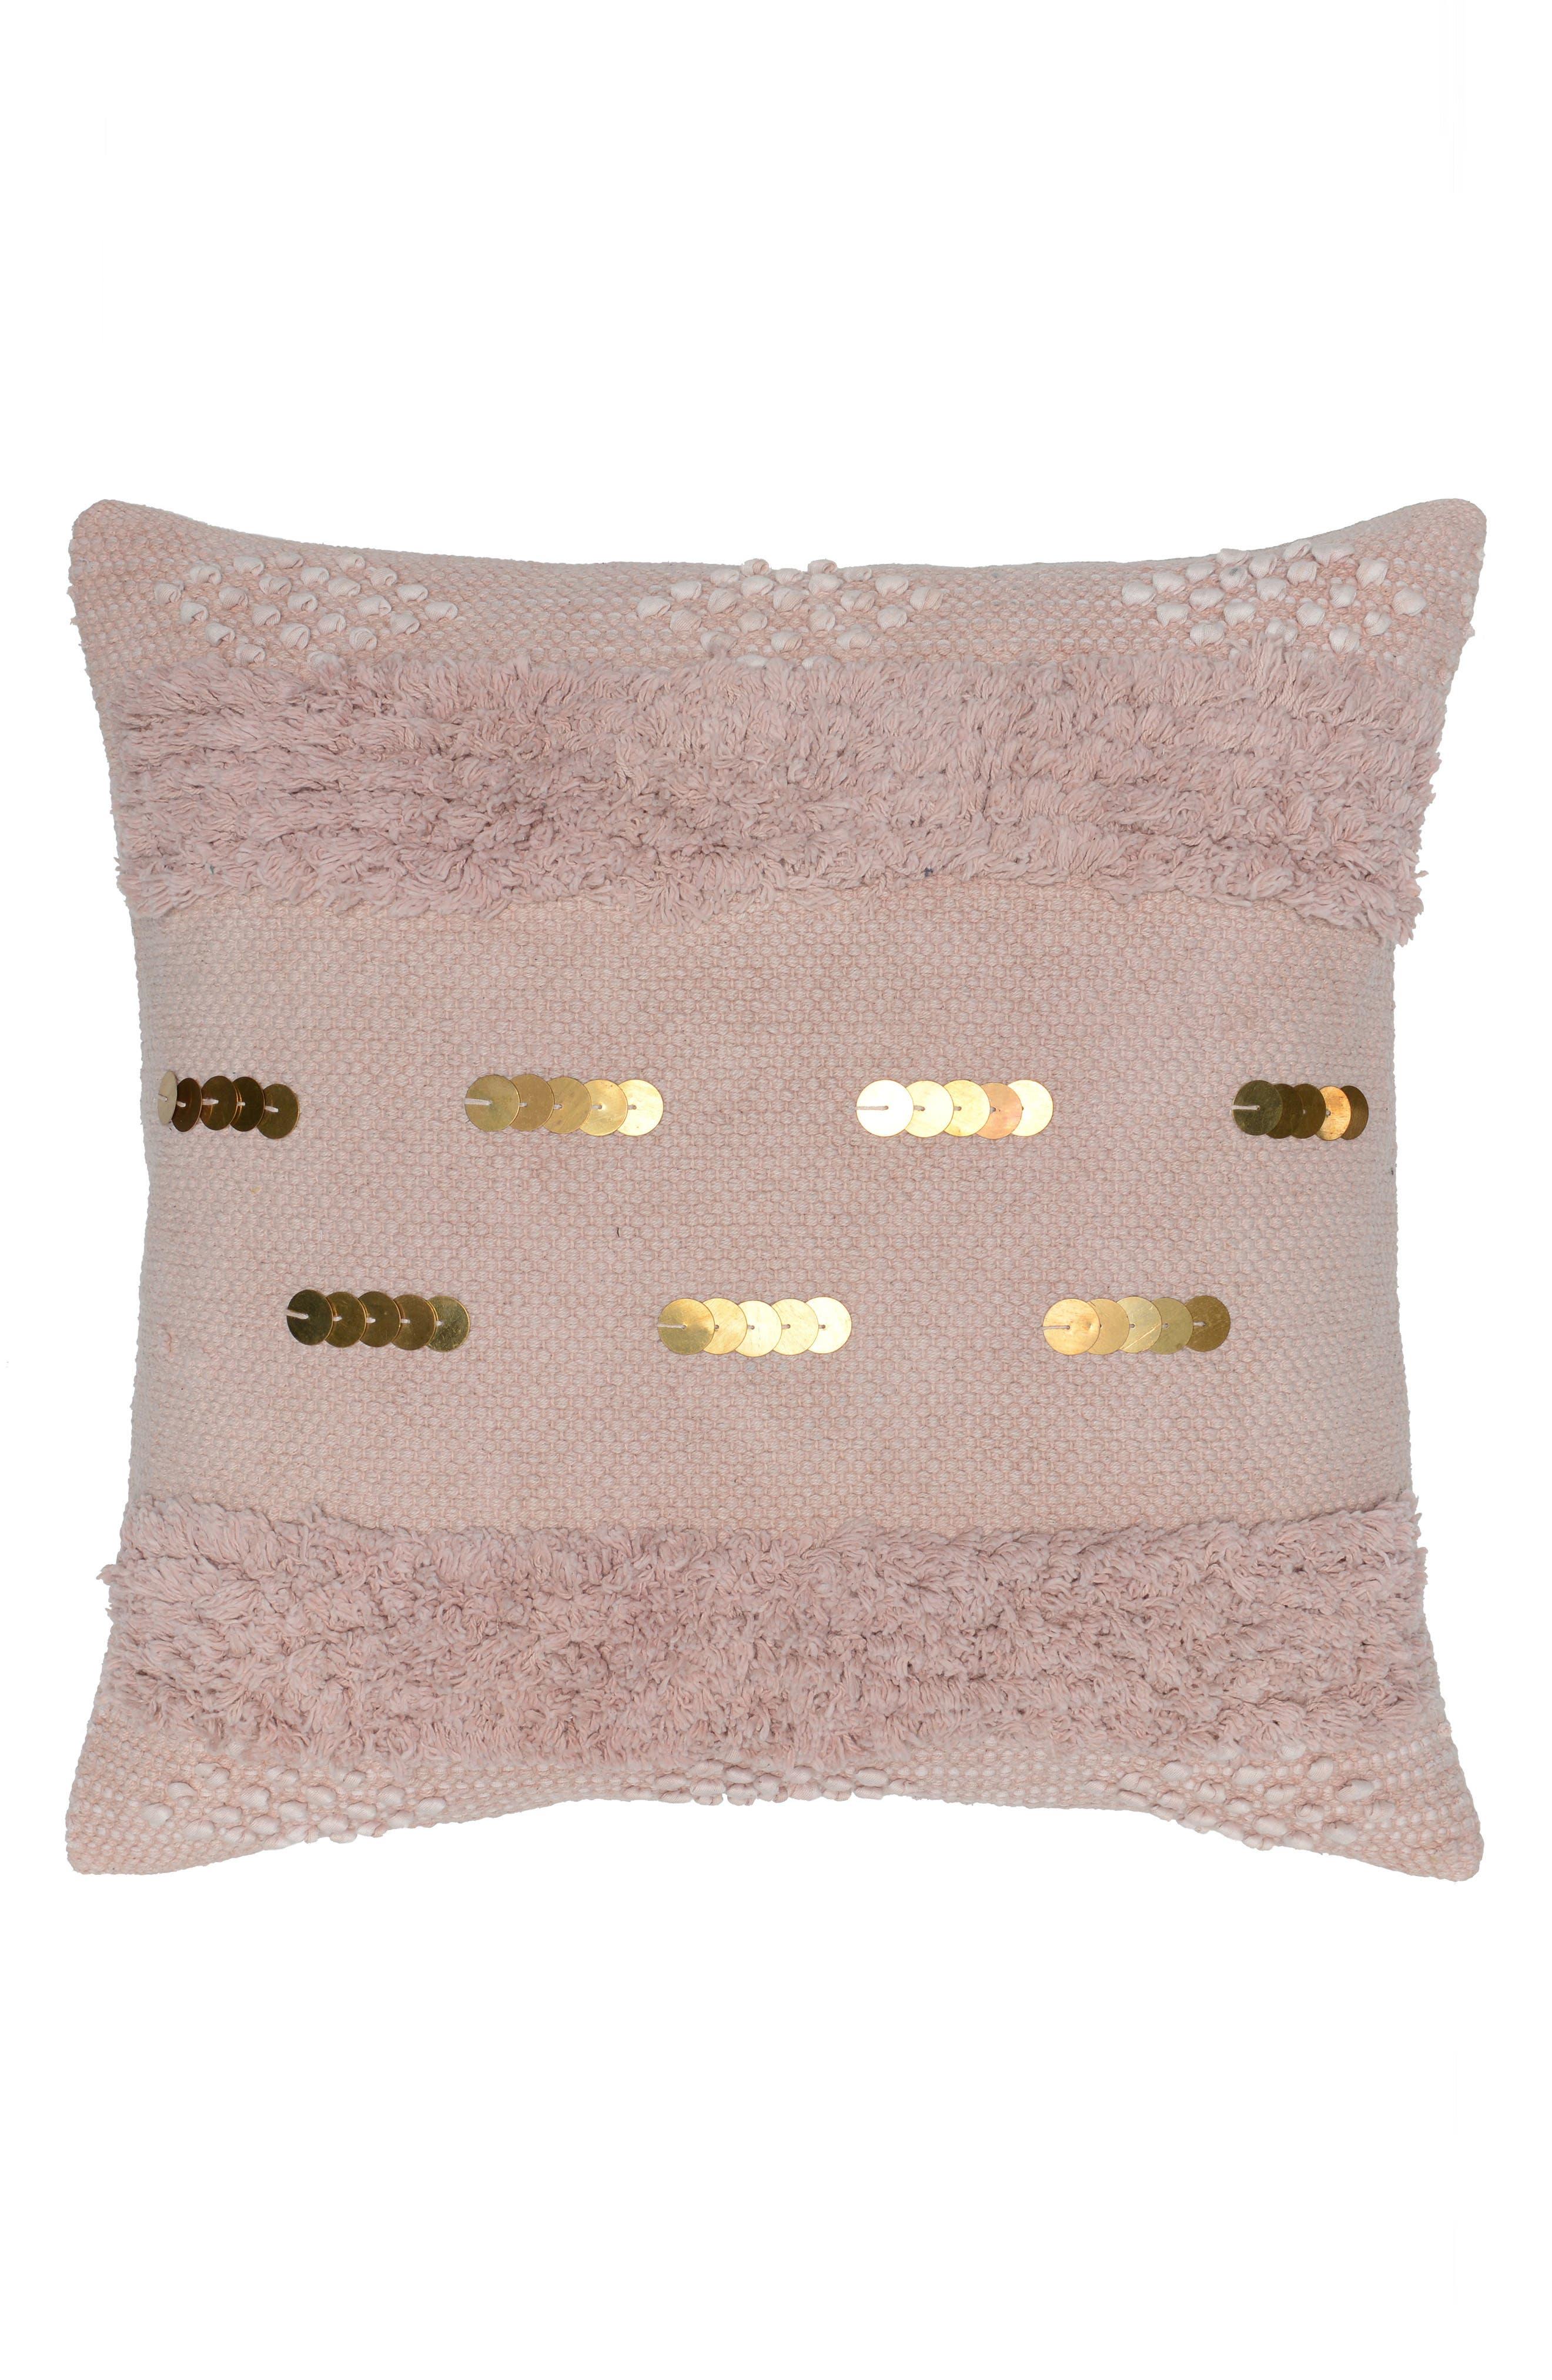 Main Image - Villa Home Collection Seine Pillow